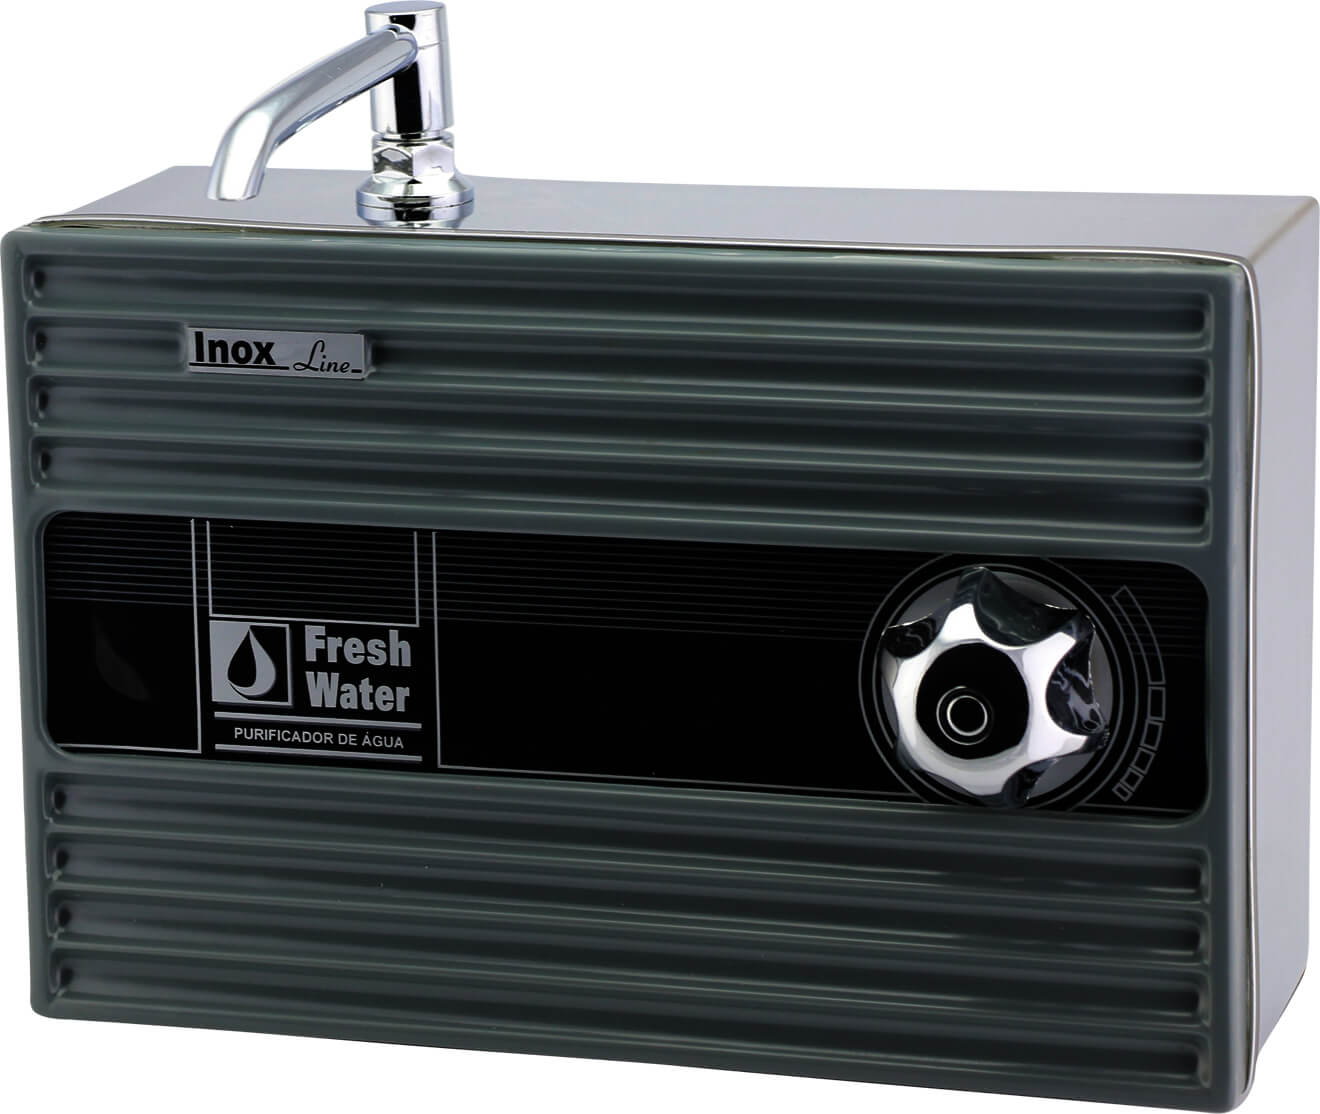 Filtro e Purificador para água Ravena Fresh Water Inox Line